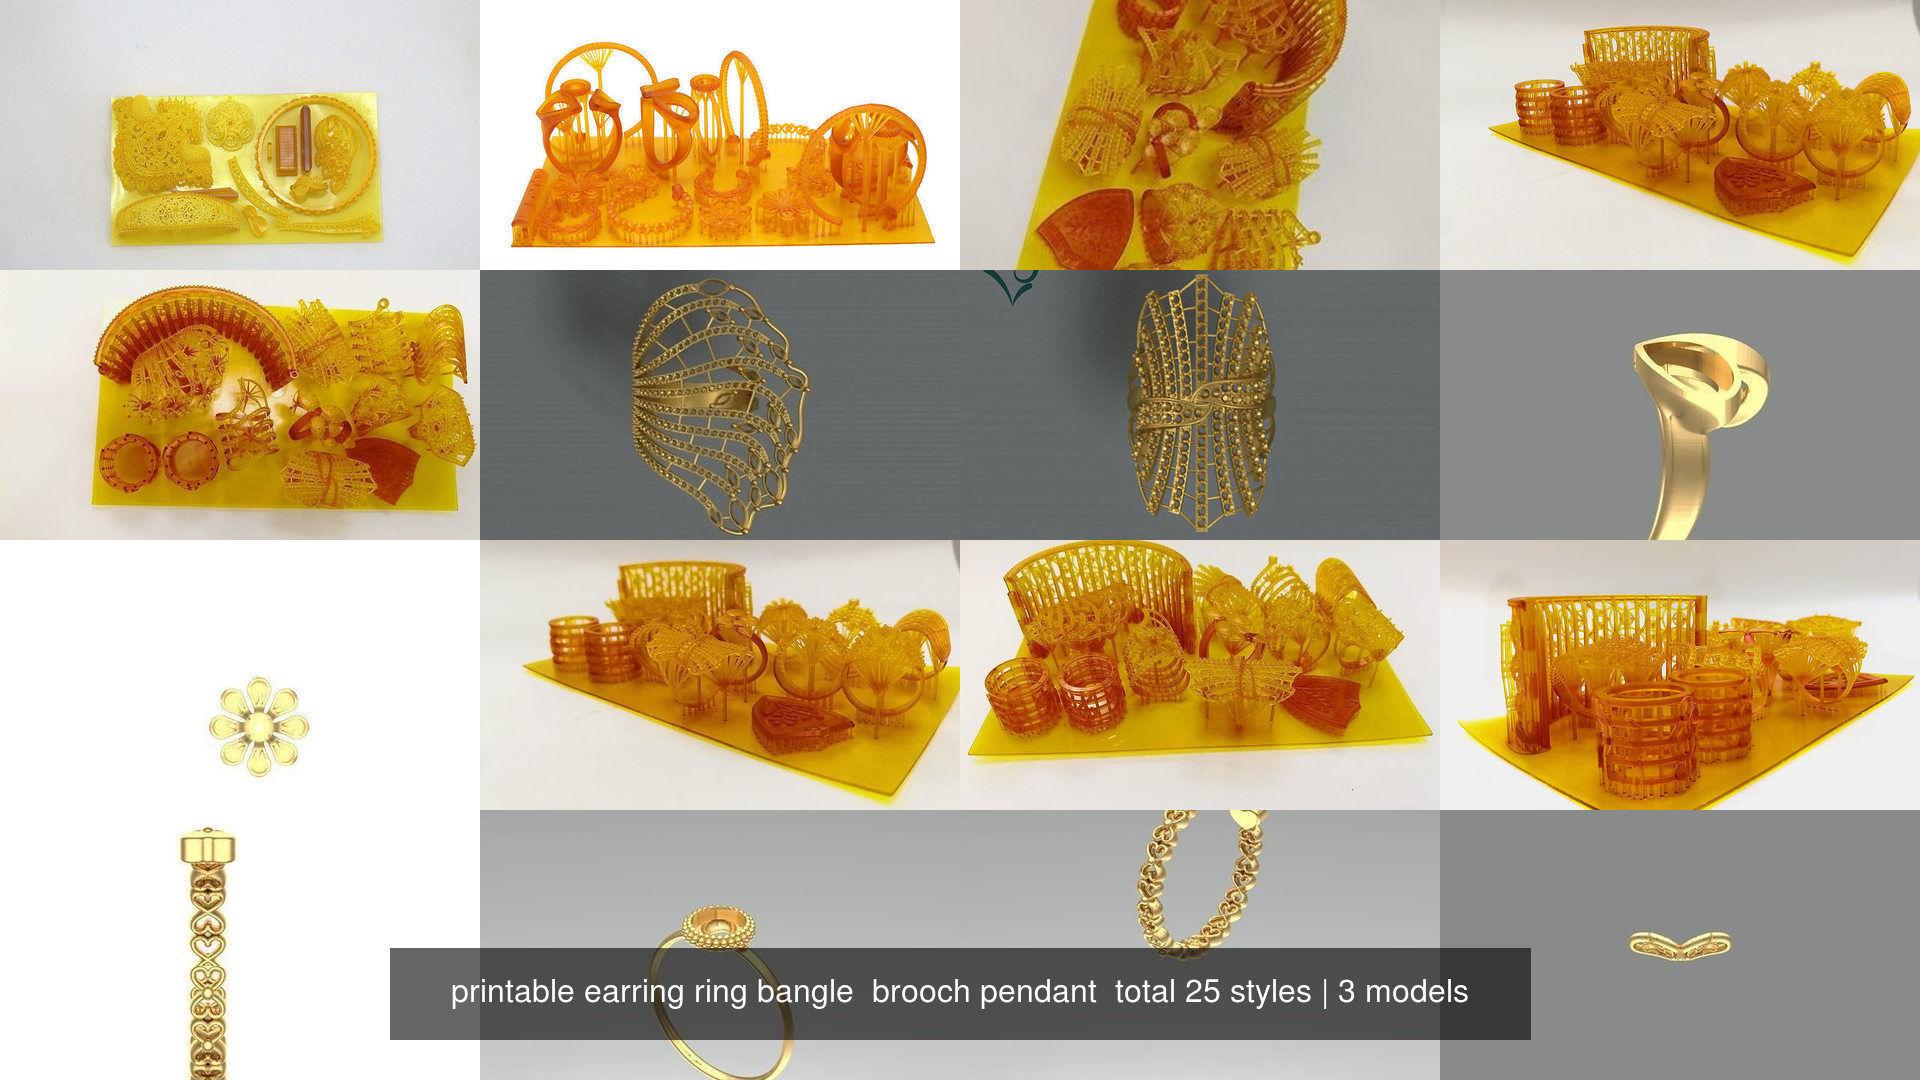 printable earring ring bangle  brooch pendant  total 25 styles